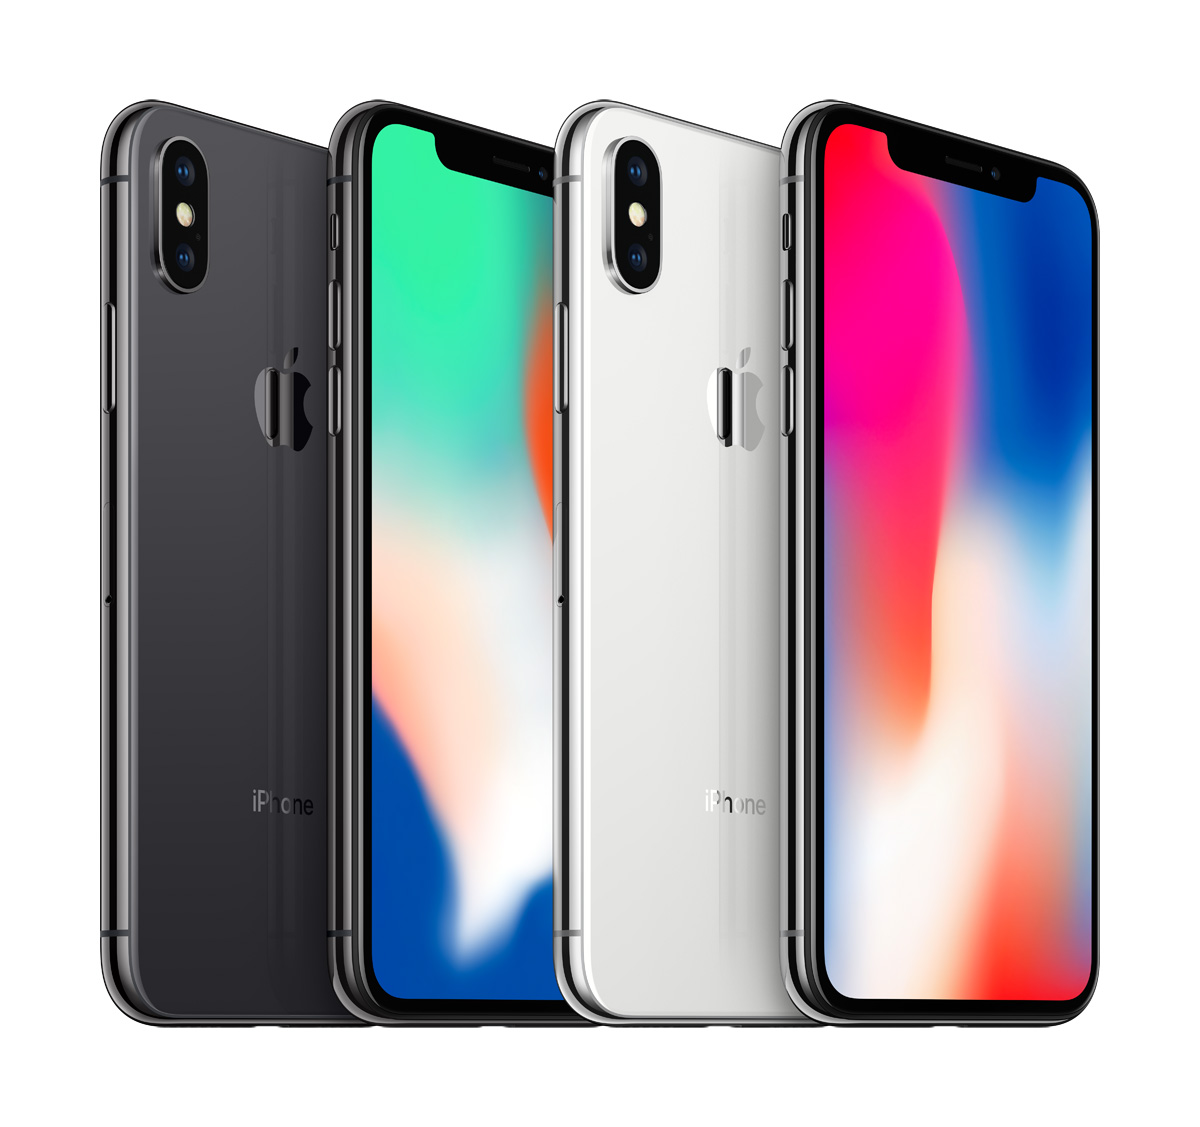 apple, globe, iphone x, smartphones, preorder, availability, price